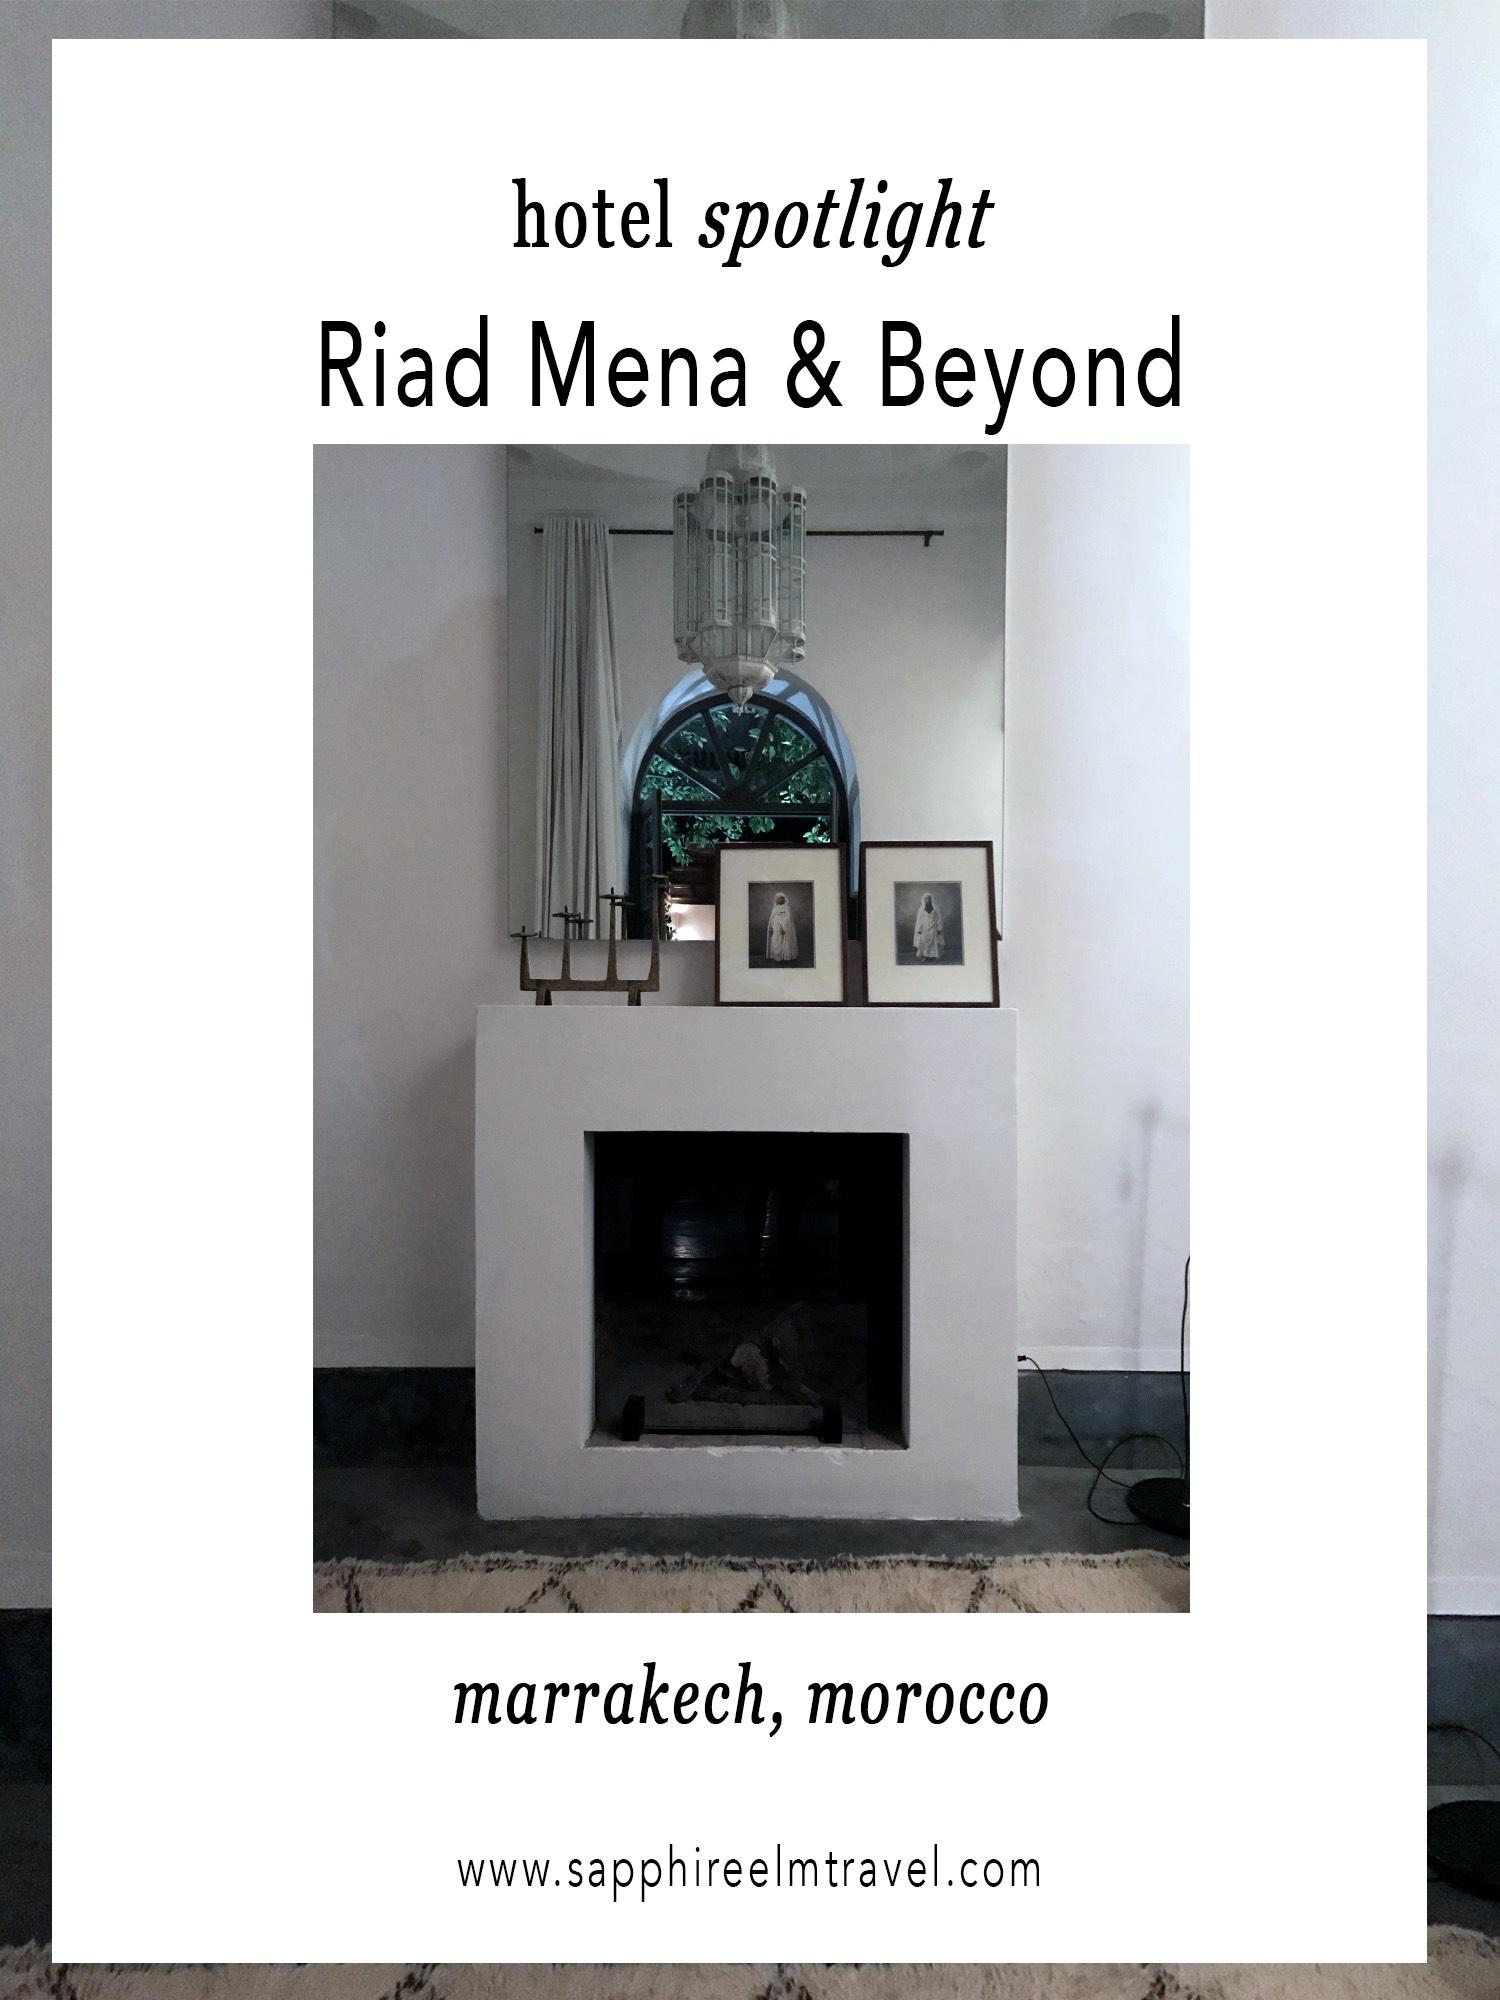 Riad Mena & Beyond Marrakech Morocco